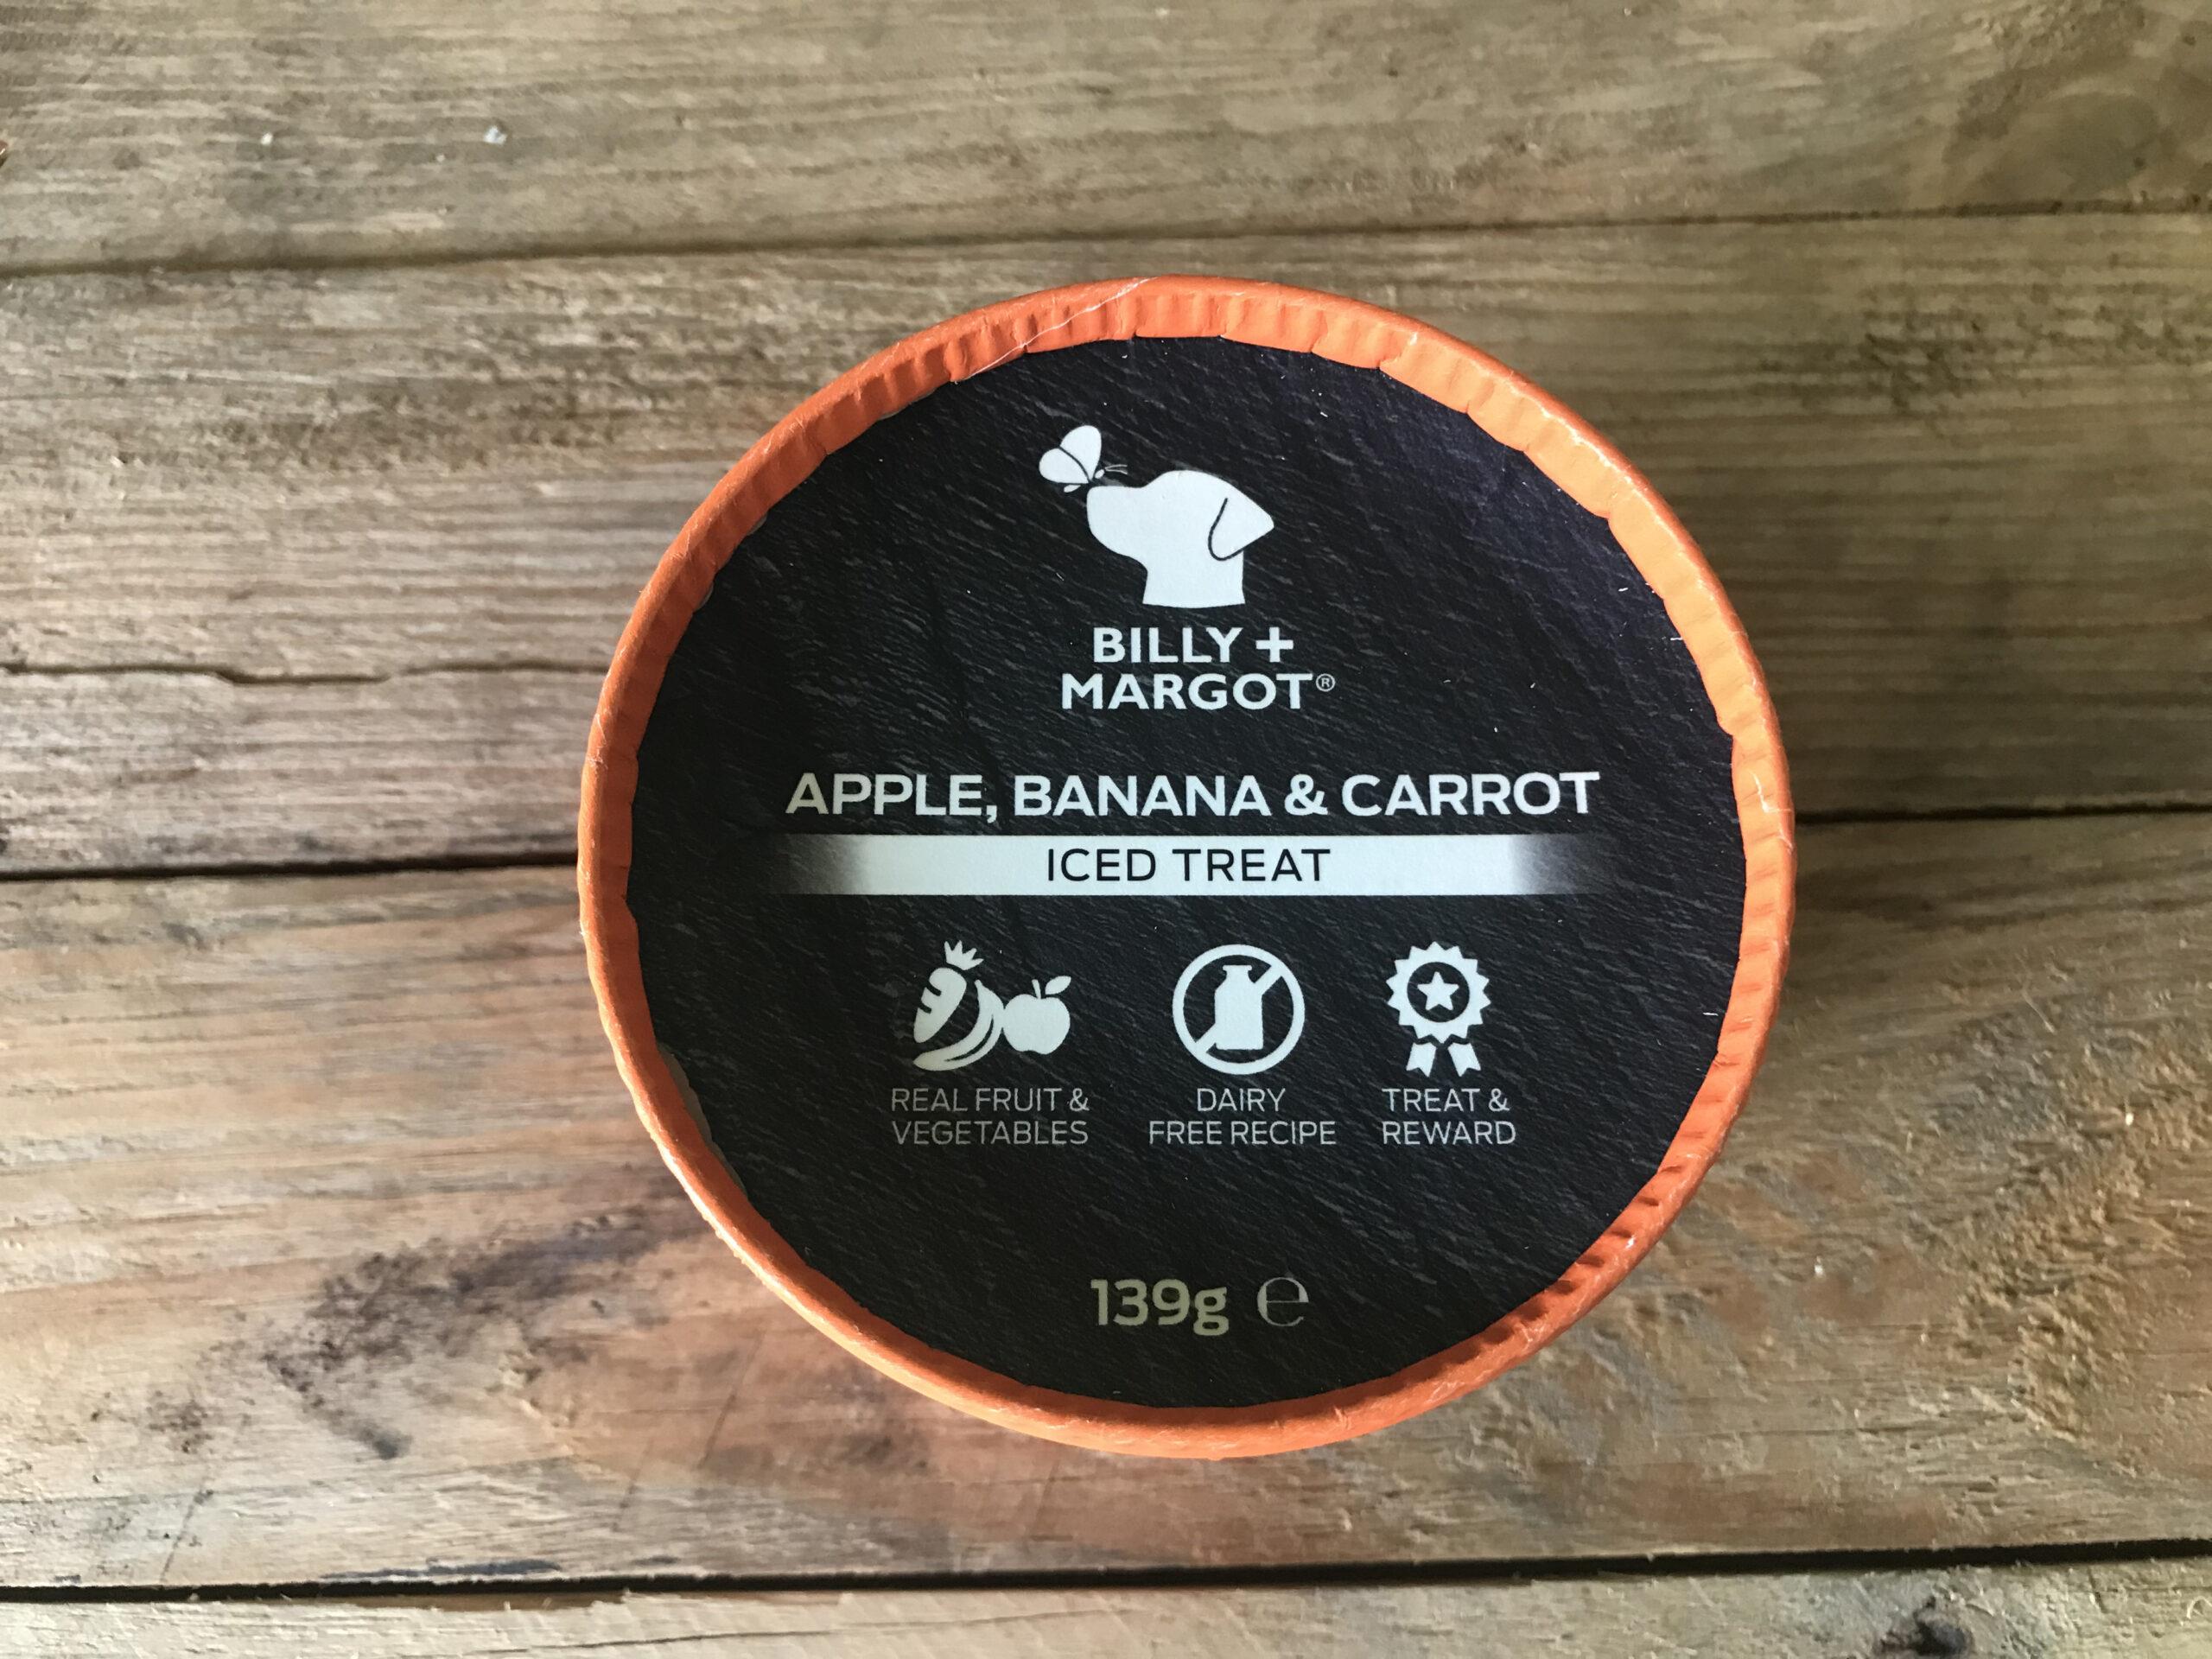 Billy + Margot Apple, Banana & Carrot Iced Treat – 139g